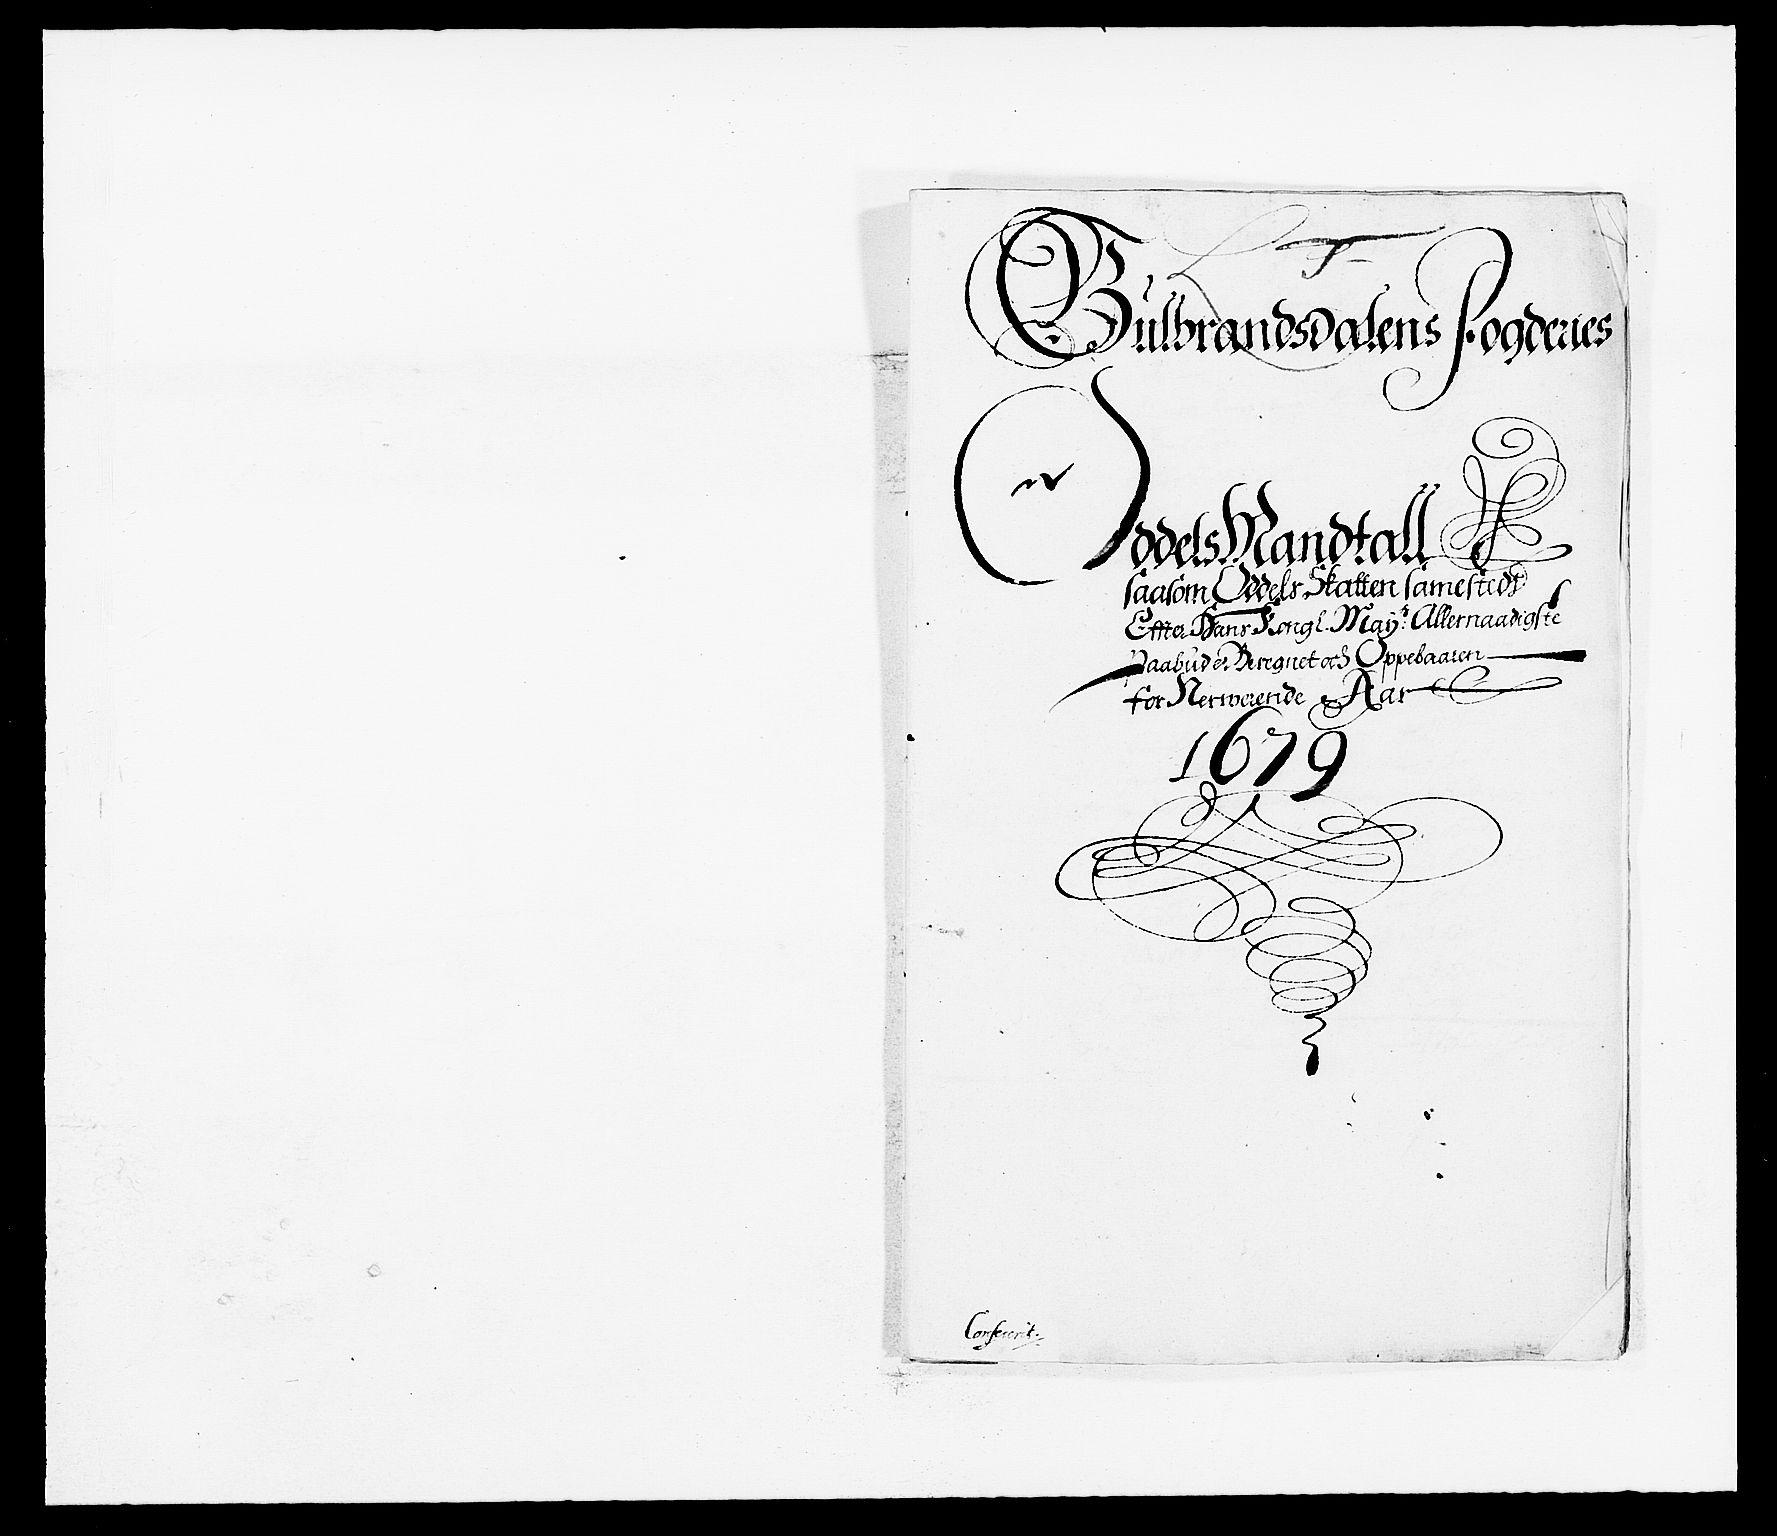 RA, Rentekammeret inntil 1814, Reviderte regnskaper, Fogderegnskap, R17/L1153: Fogderegnskap Gudbrandsdal, 1678-1679, s. 272